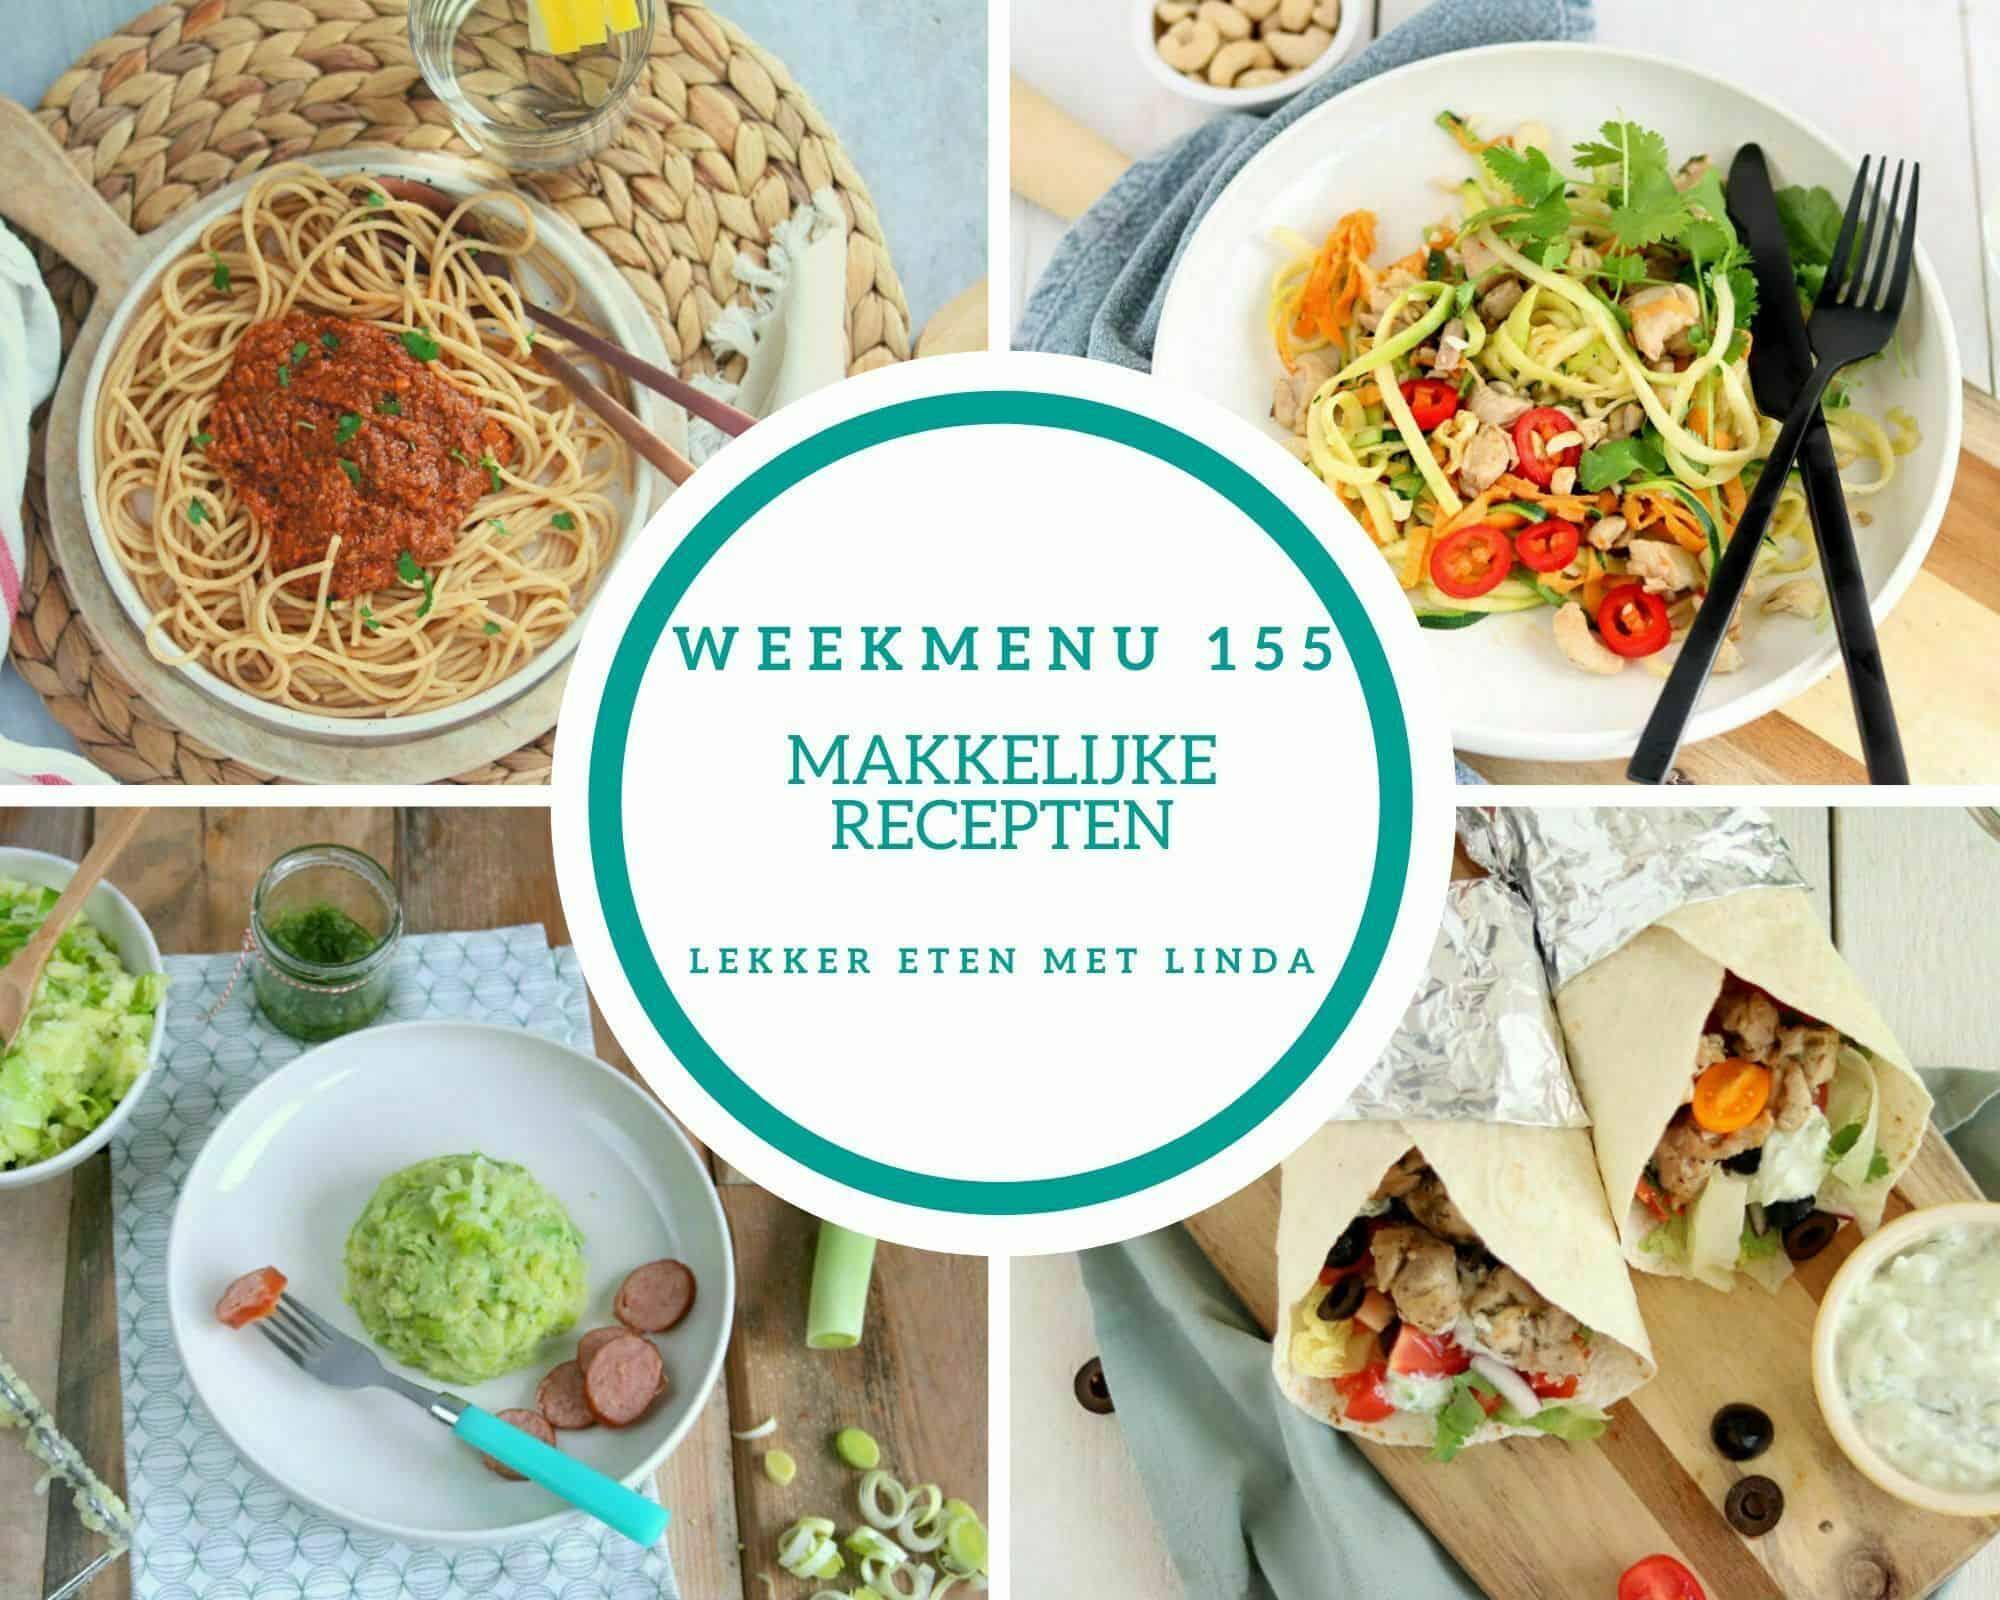 Weekmenu 155 makkelijke recepten